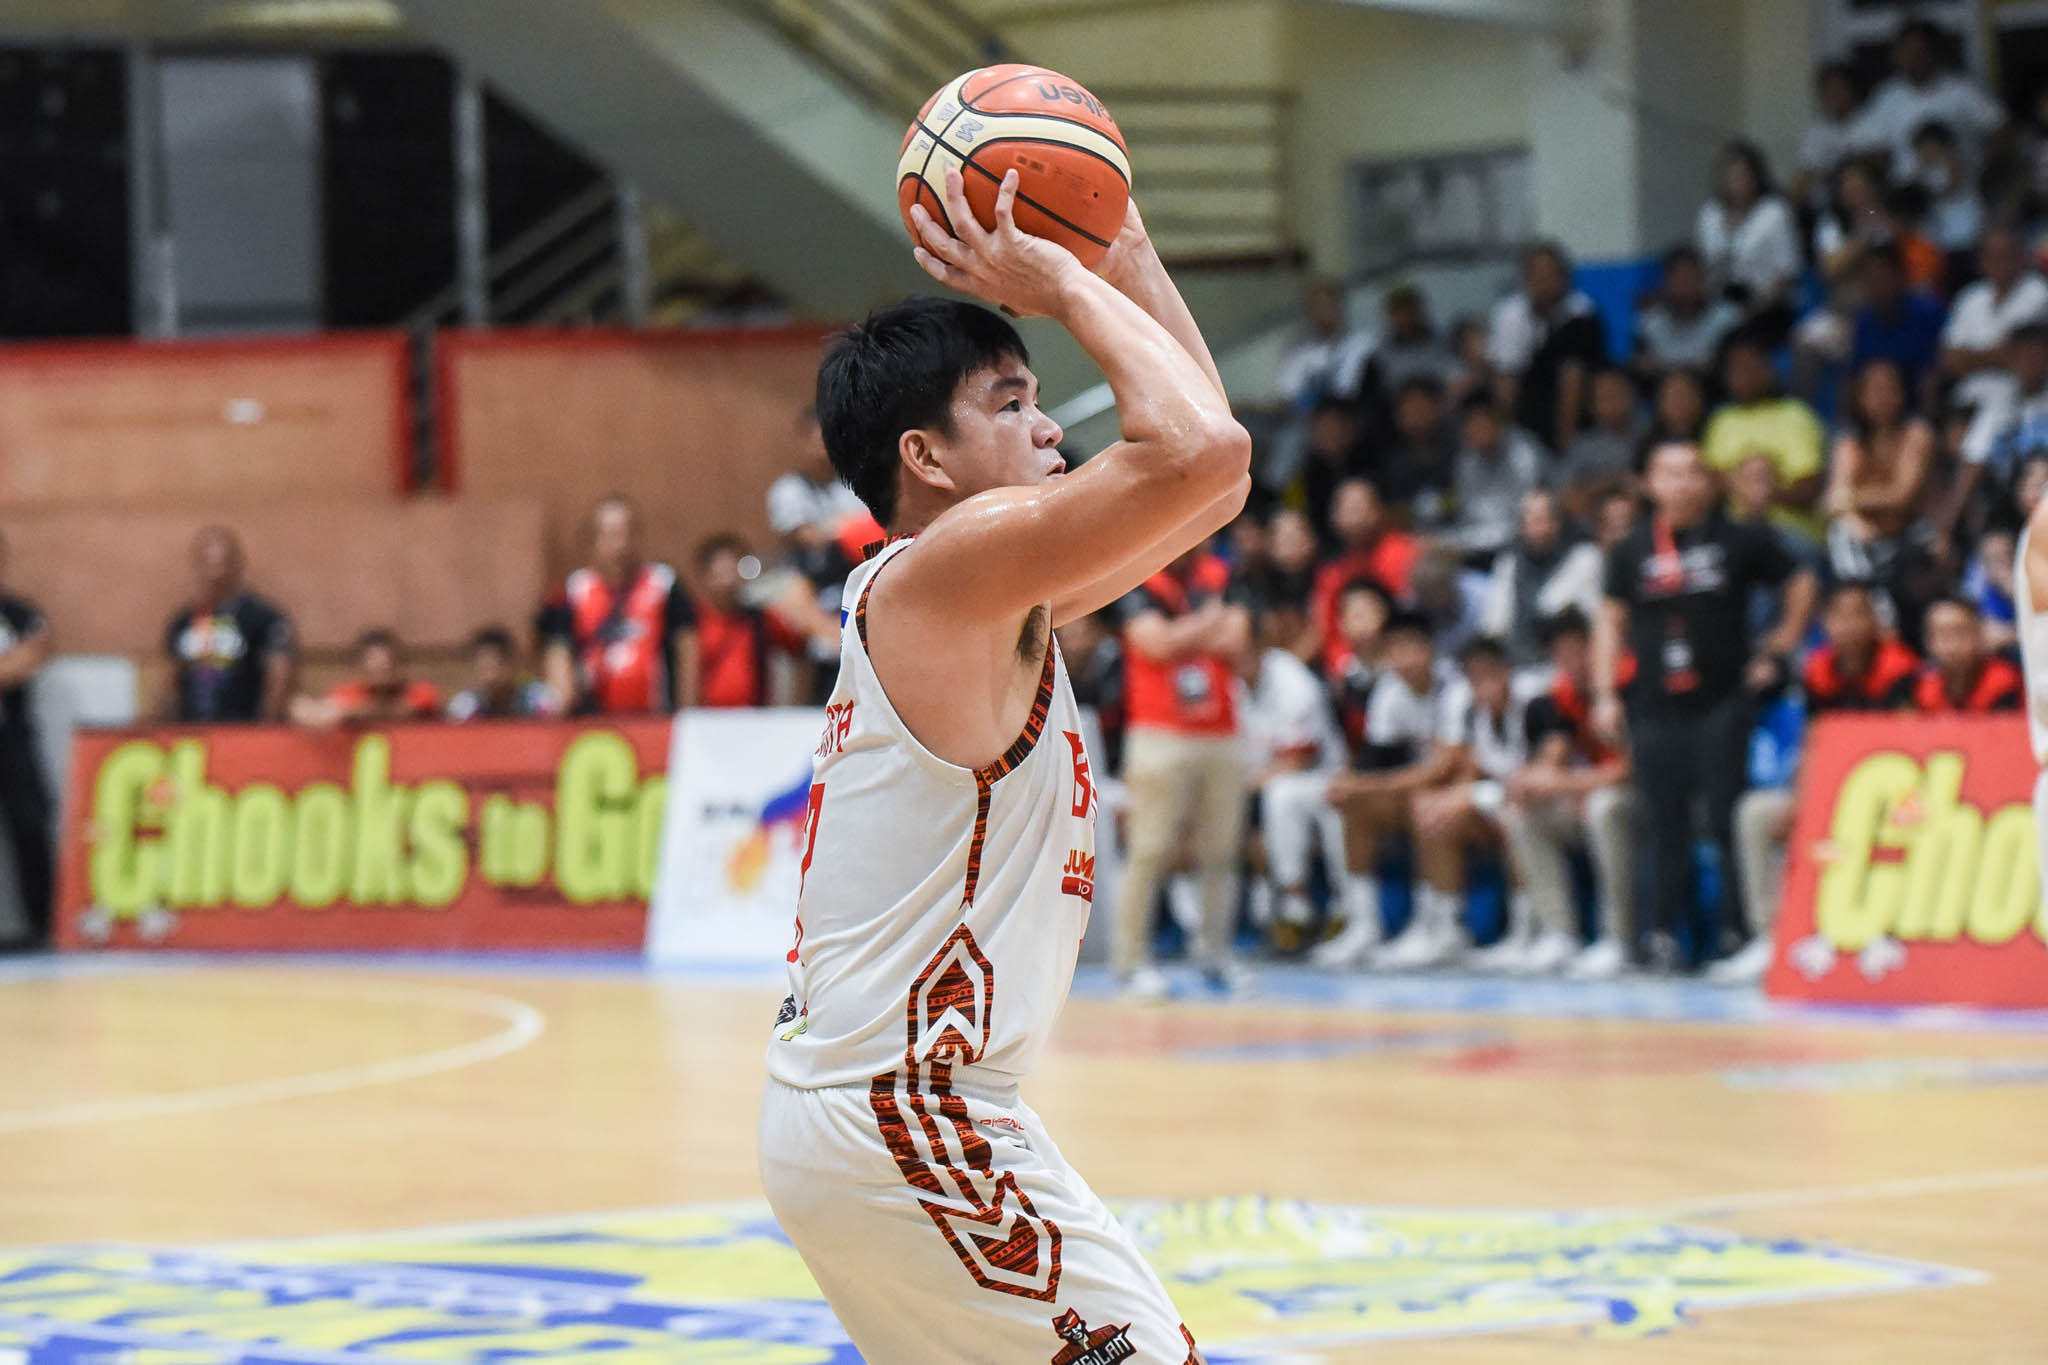 MPBL-2019-2020-Basilan-vs.-Iloilo-1ST-PHOTO-JERALD-BAUTISTA-BASILAN With Bulanadi in Gilas, Jhaps Bautista steps up for Basilan Basketball MPBL News  - philippine sports news